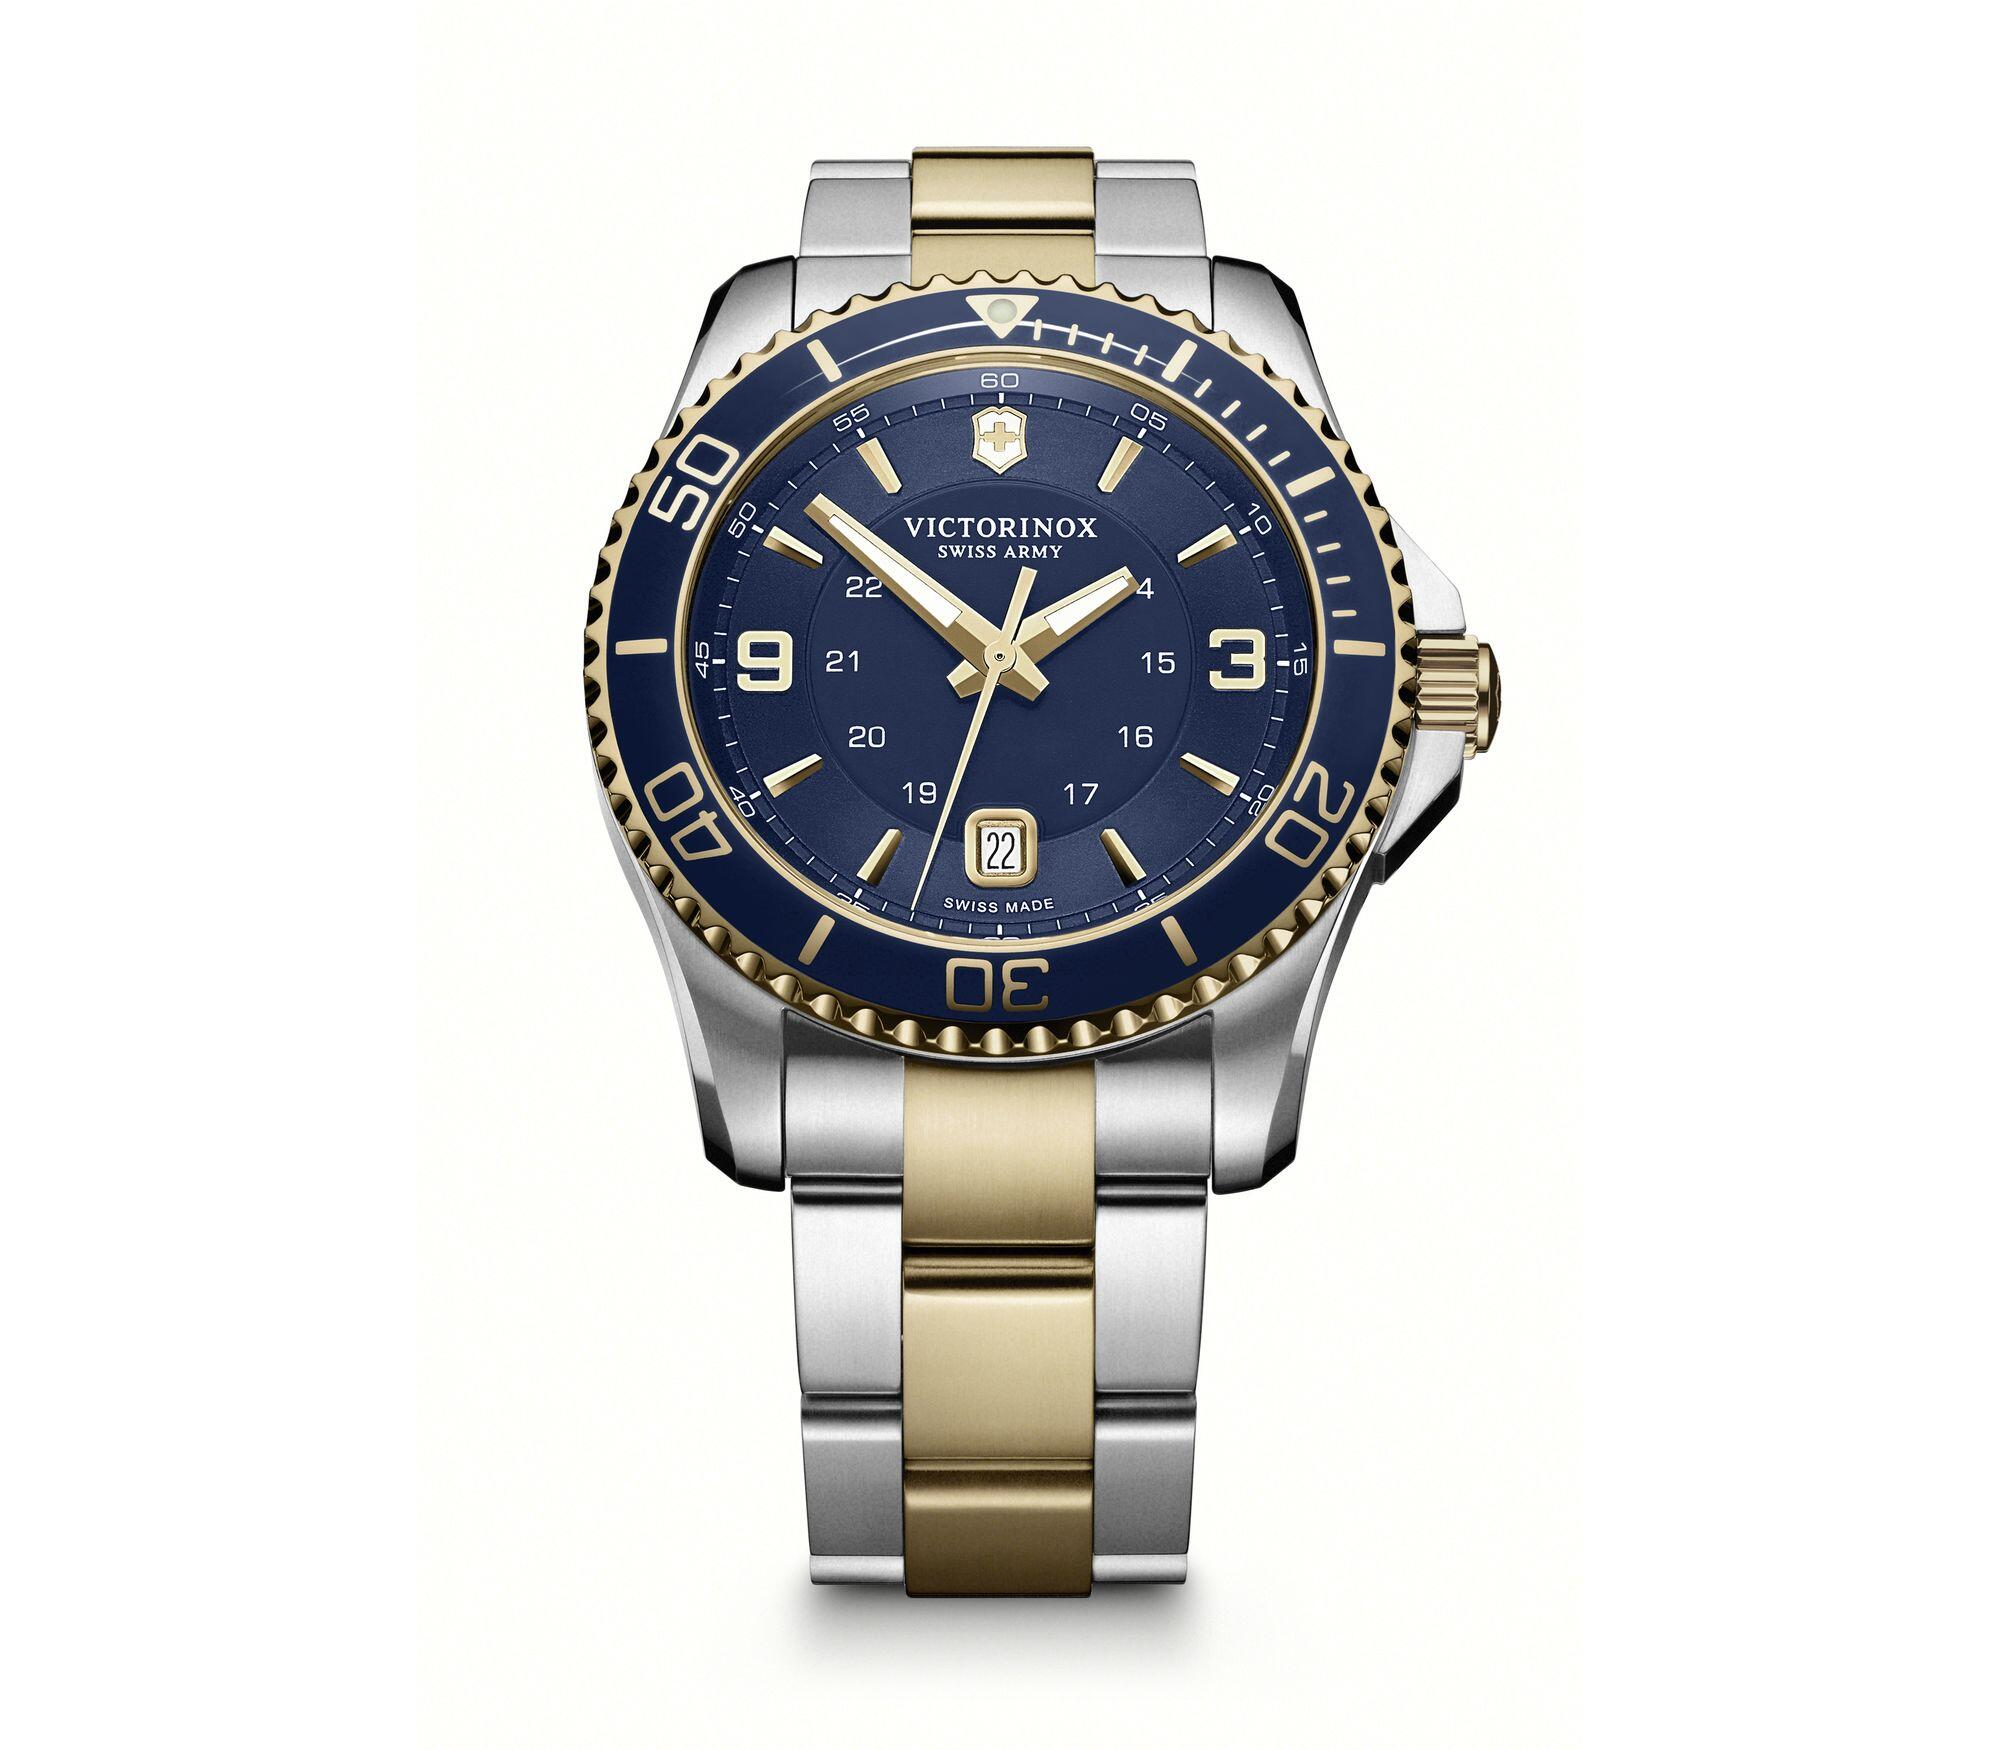 Relógio Masculino Victorinox Azul - Maverick - 241789